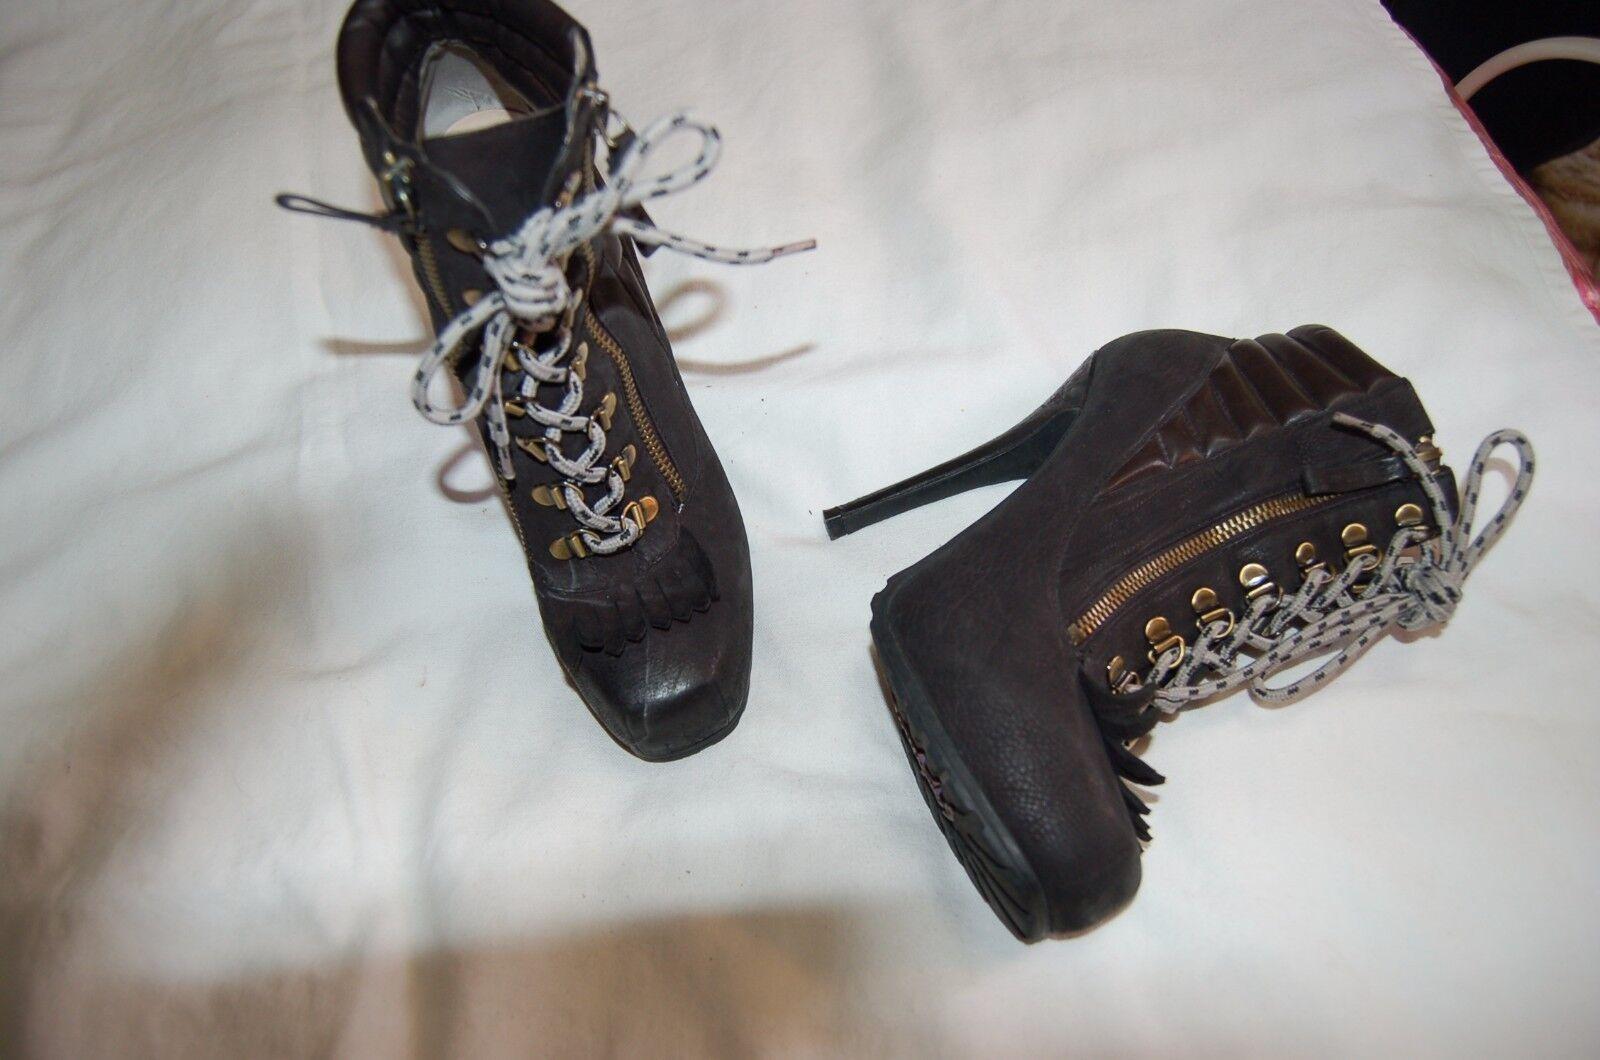 Boutique 9 Black Suede Steam Punk Ankle Heels Boots Size 8 1/2